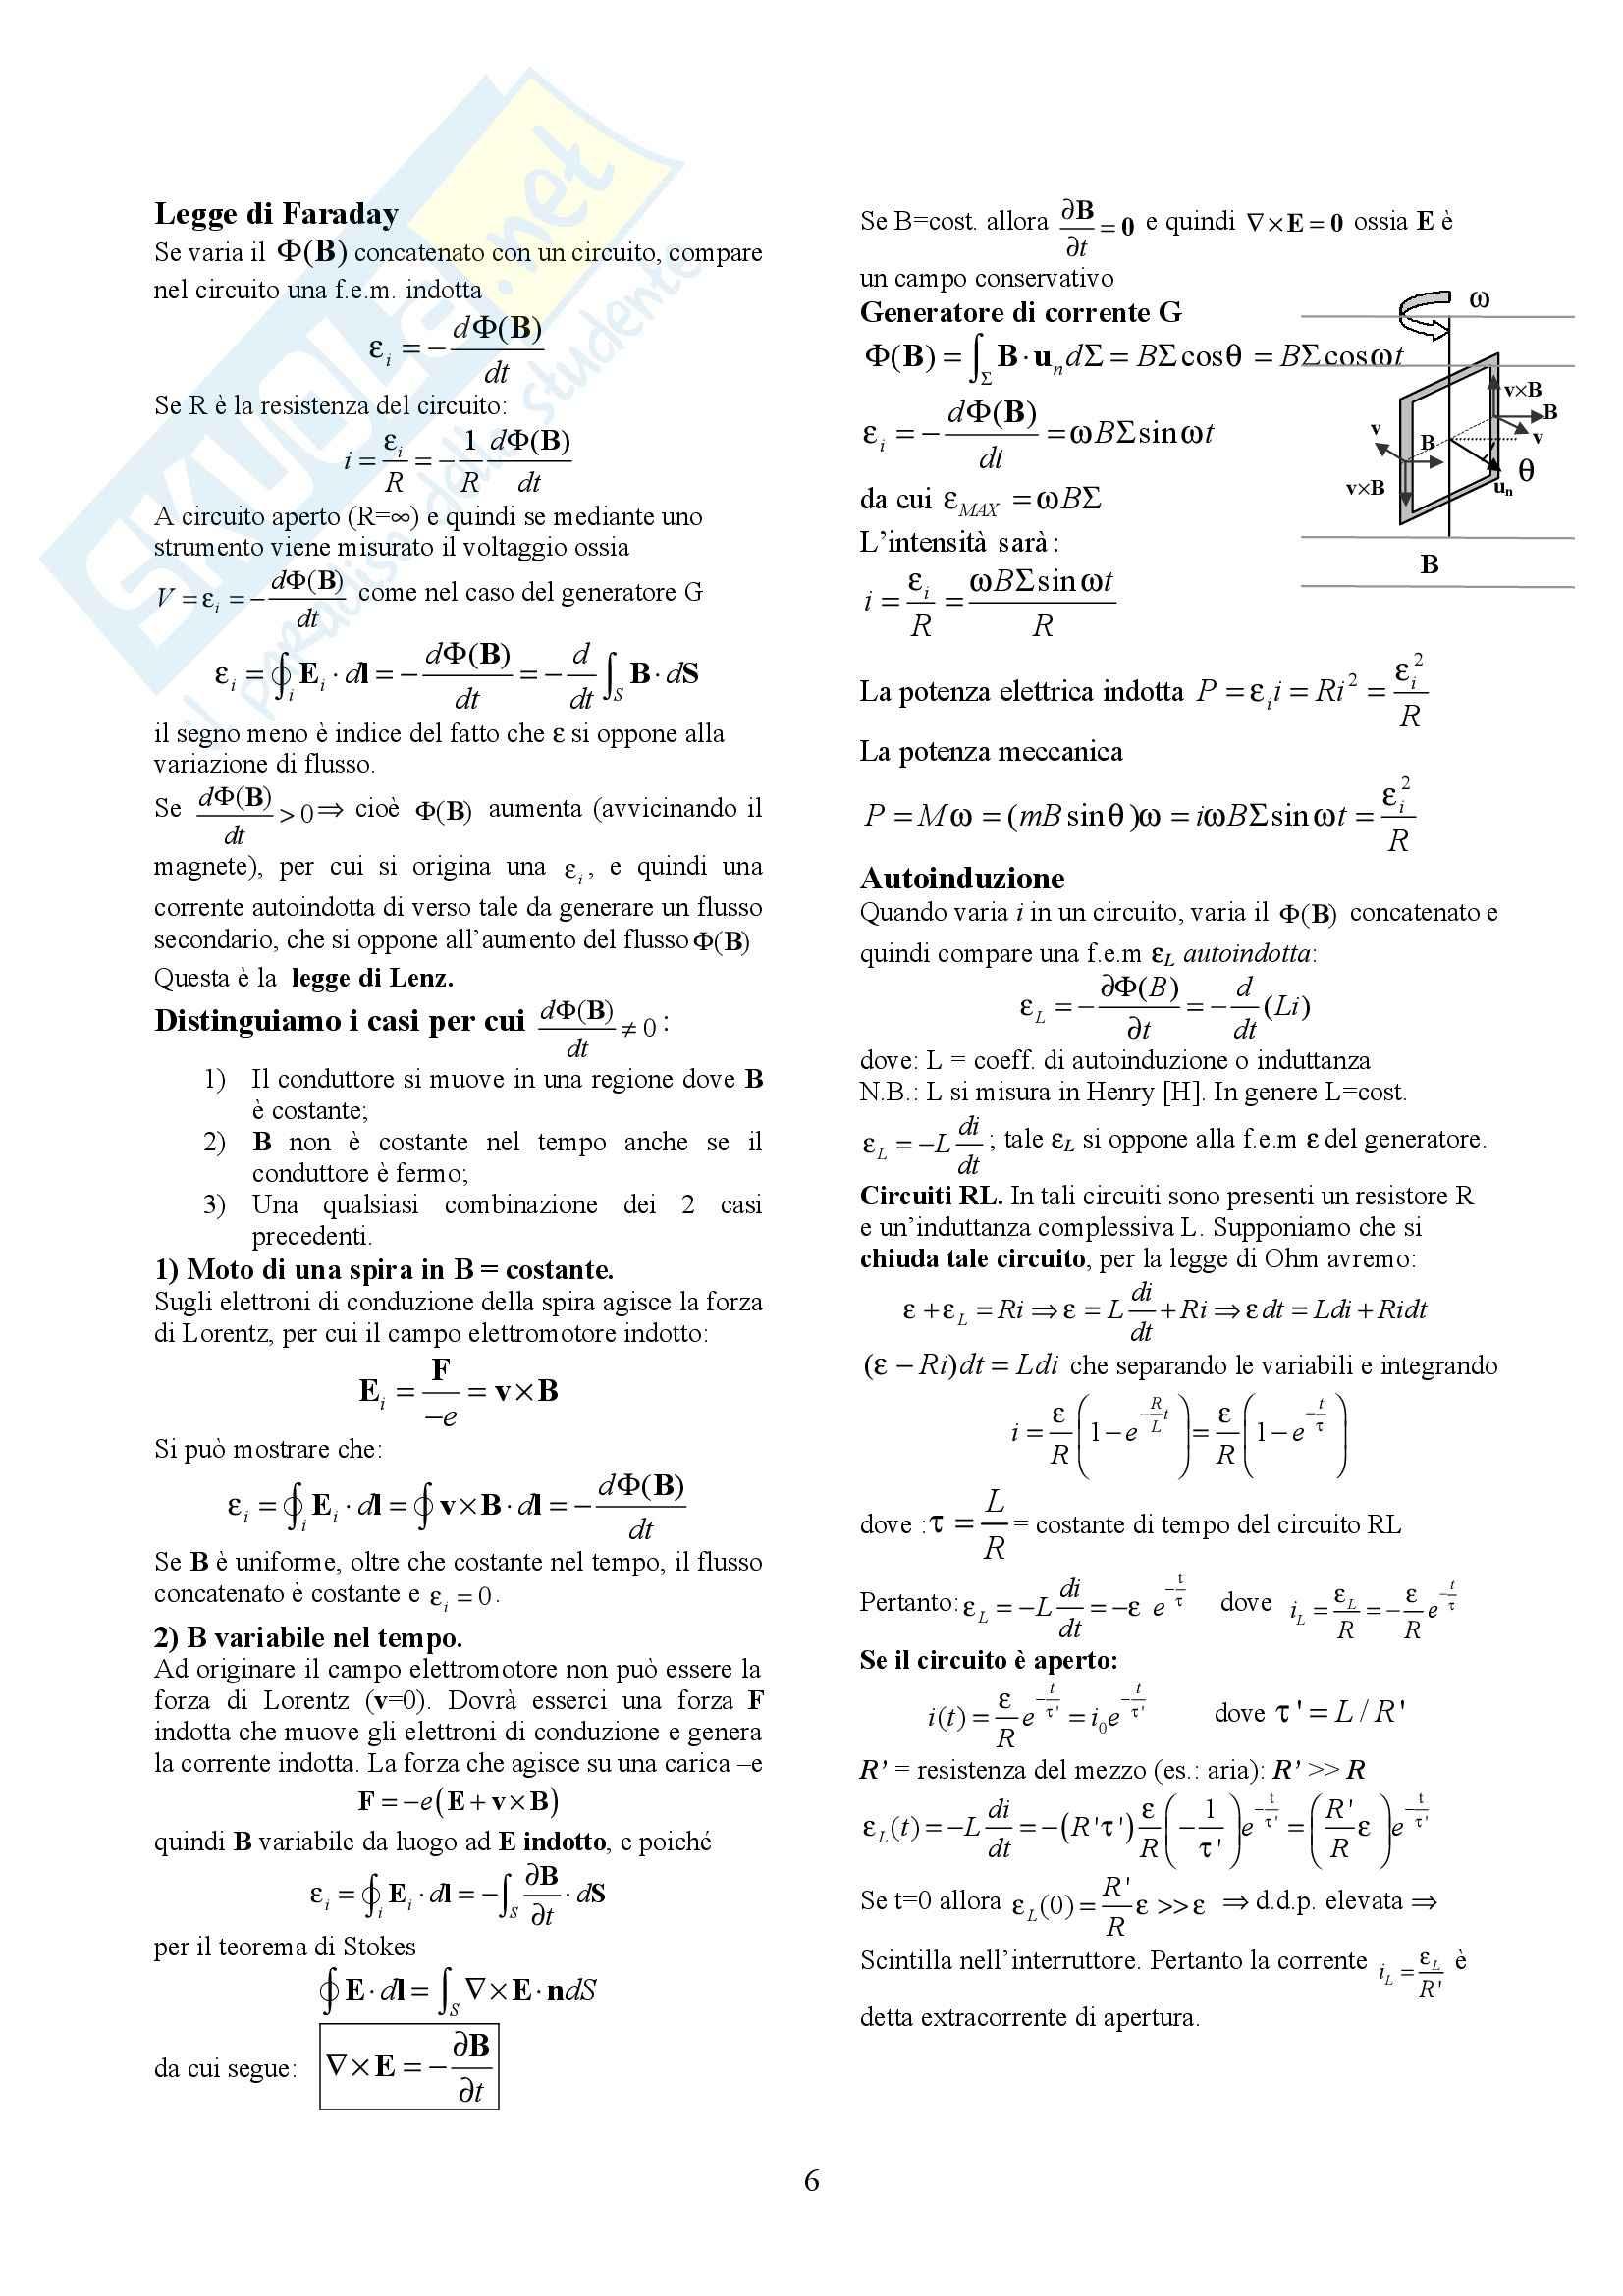 Fisica generale II - Formulario Pag. 6